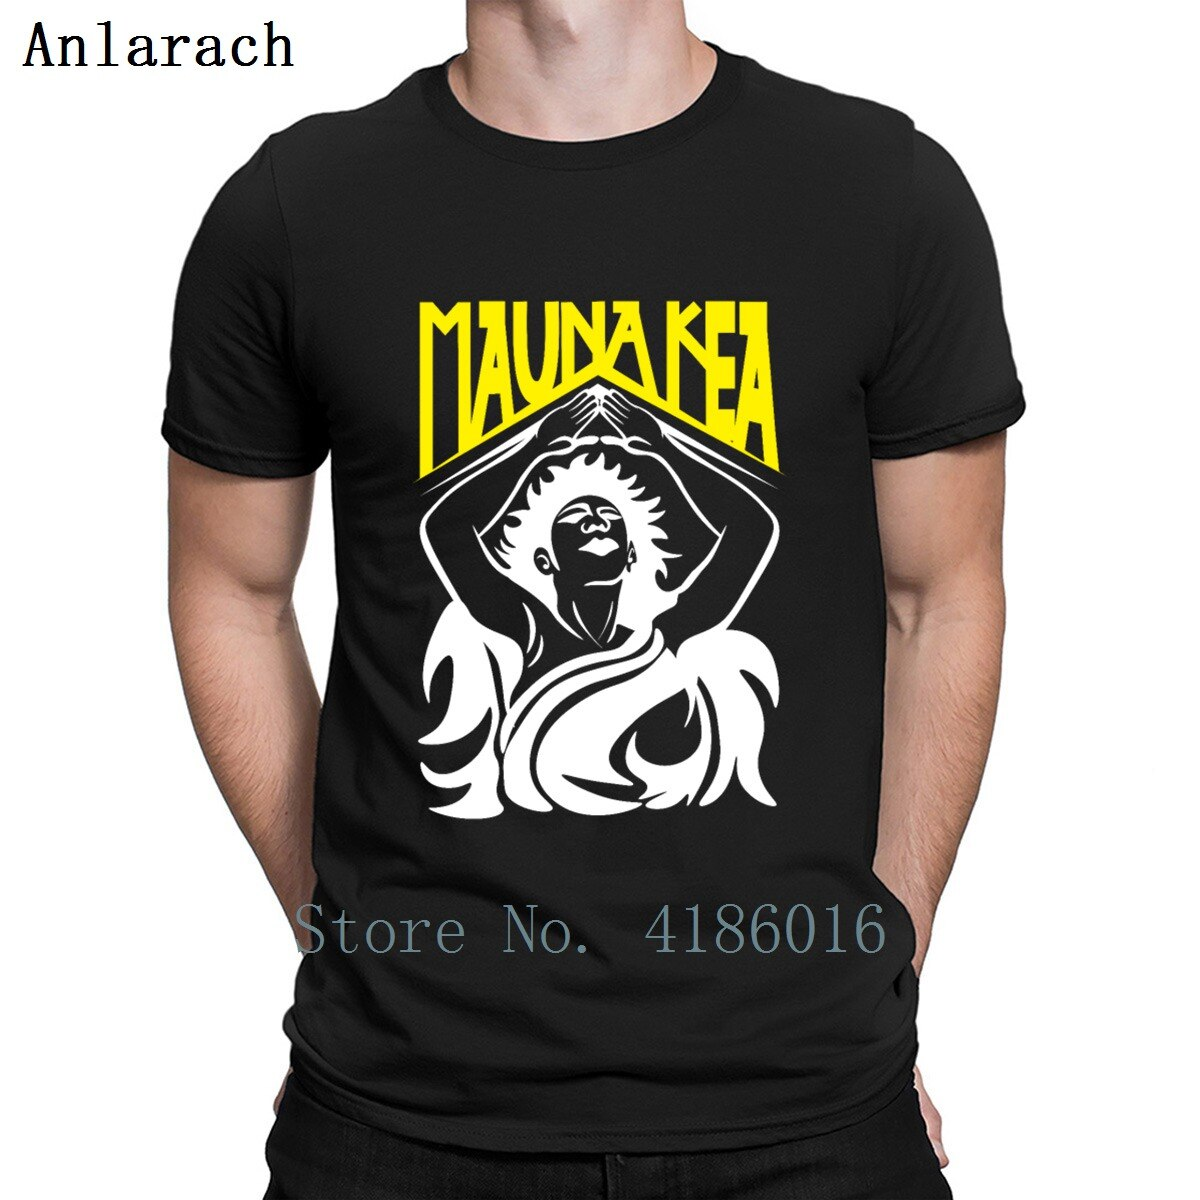 Mauna Kea Ritual Protest Tmt hombres mujeres camiseta divertida verano lindo camiseta Normal sobre tamaño 5xl diseñador Normal camisa